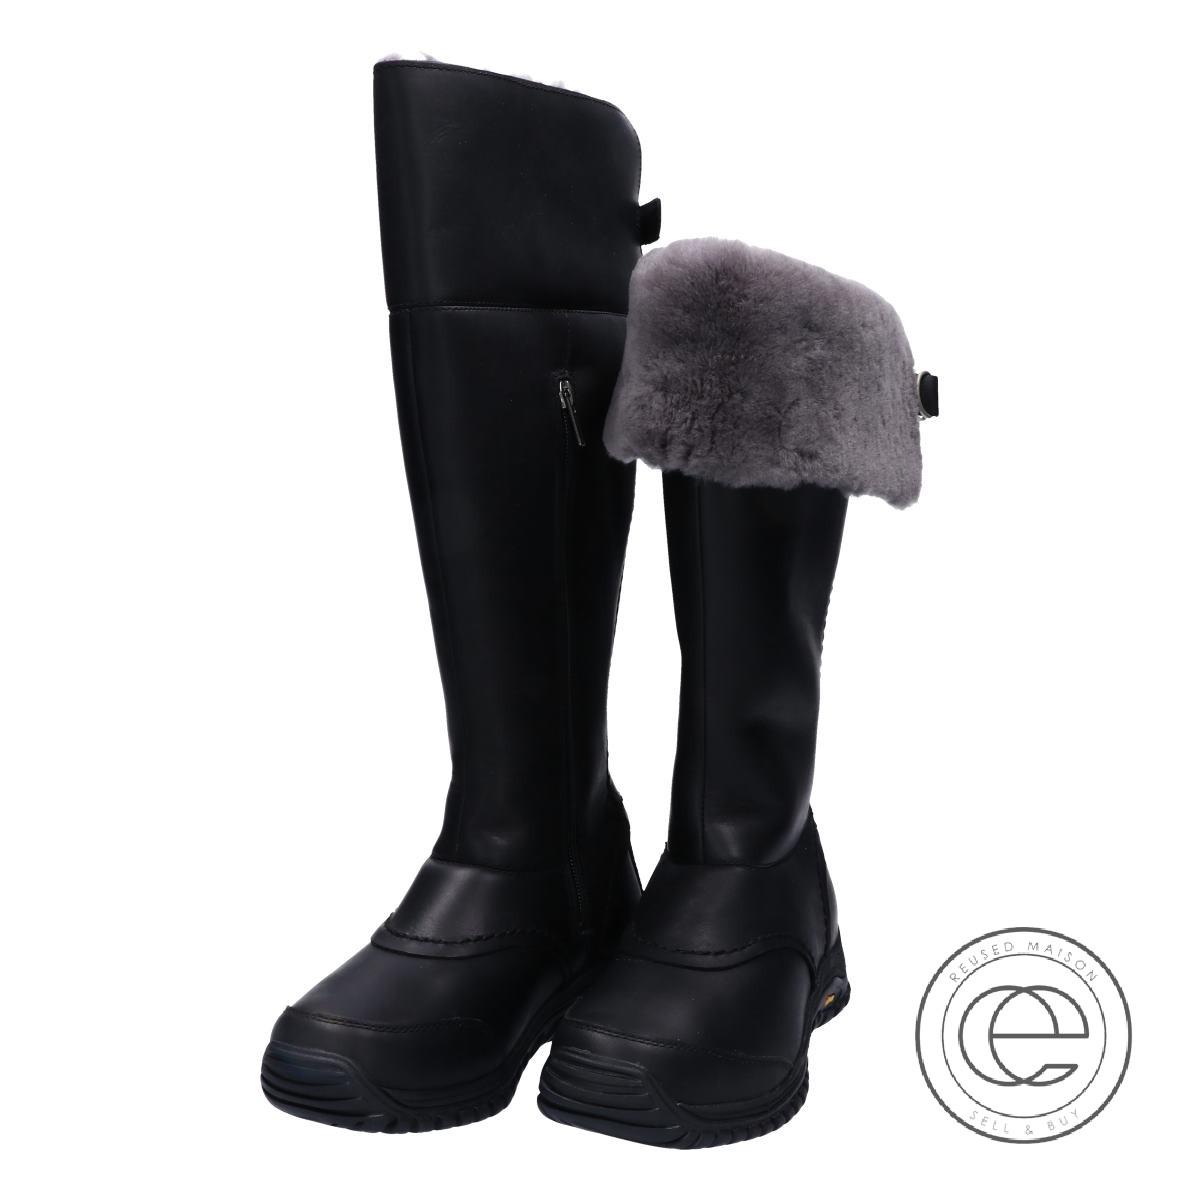 14e16d5ec96 UGG アグ 1012519 MIKO Miko snow boot shoes 23 black Lady's